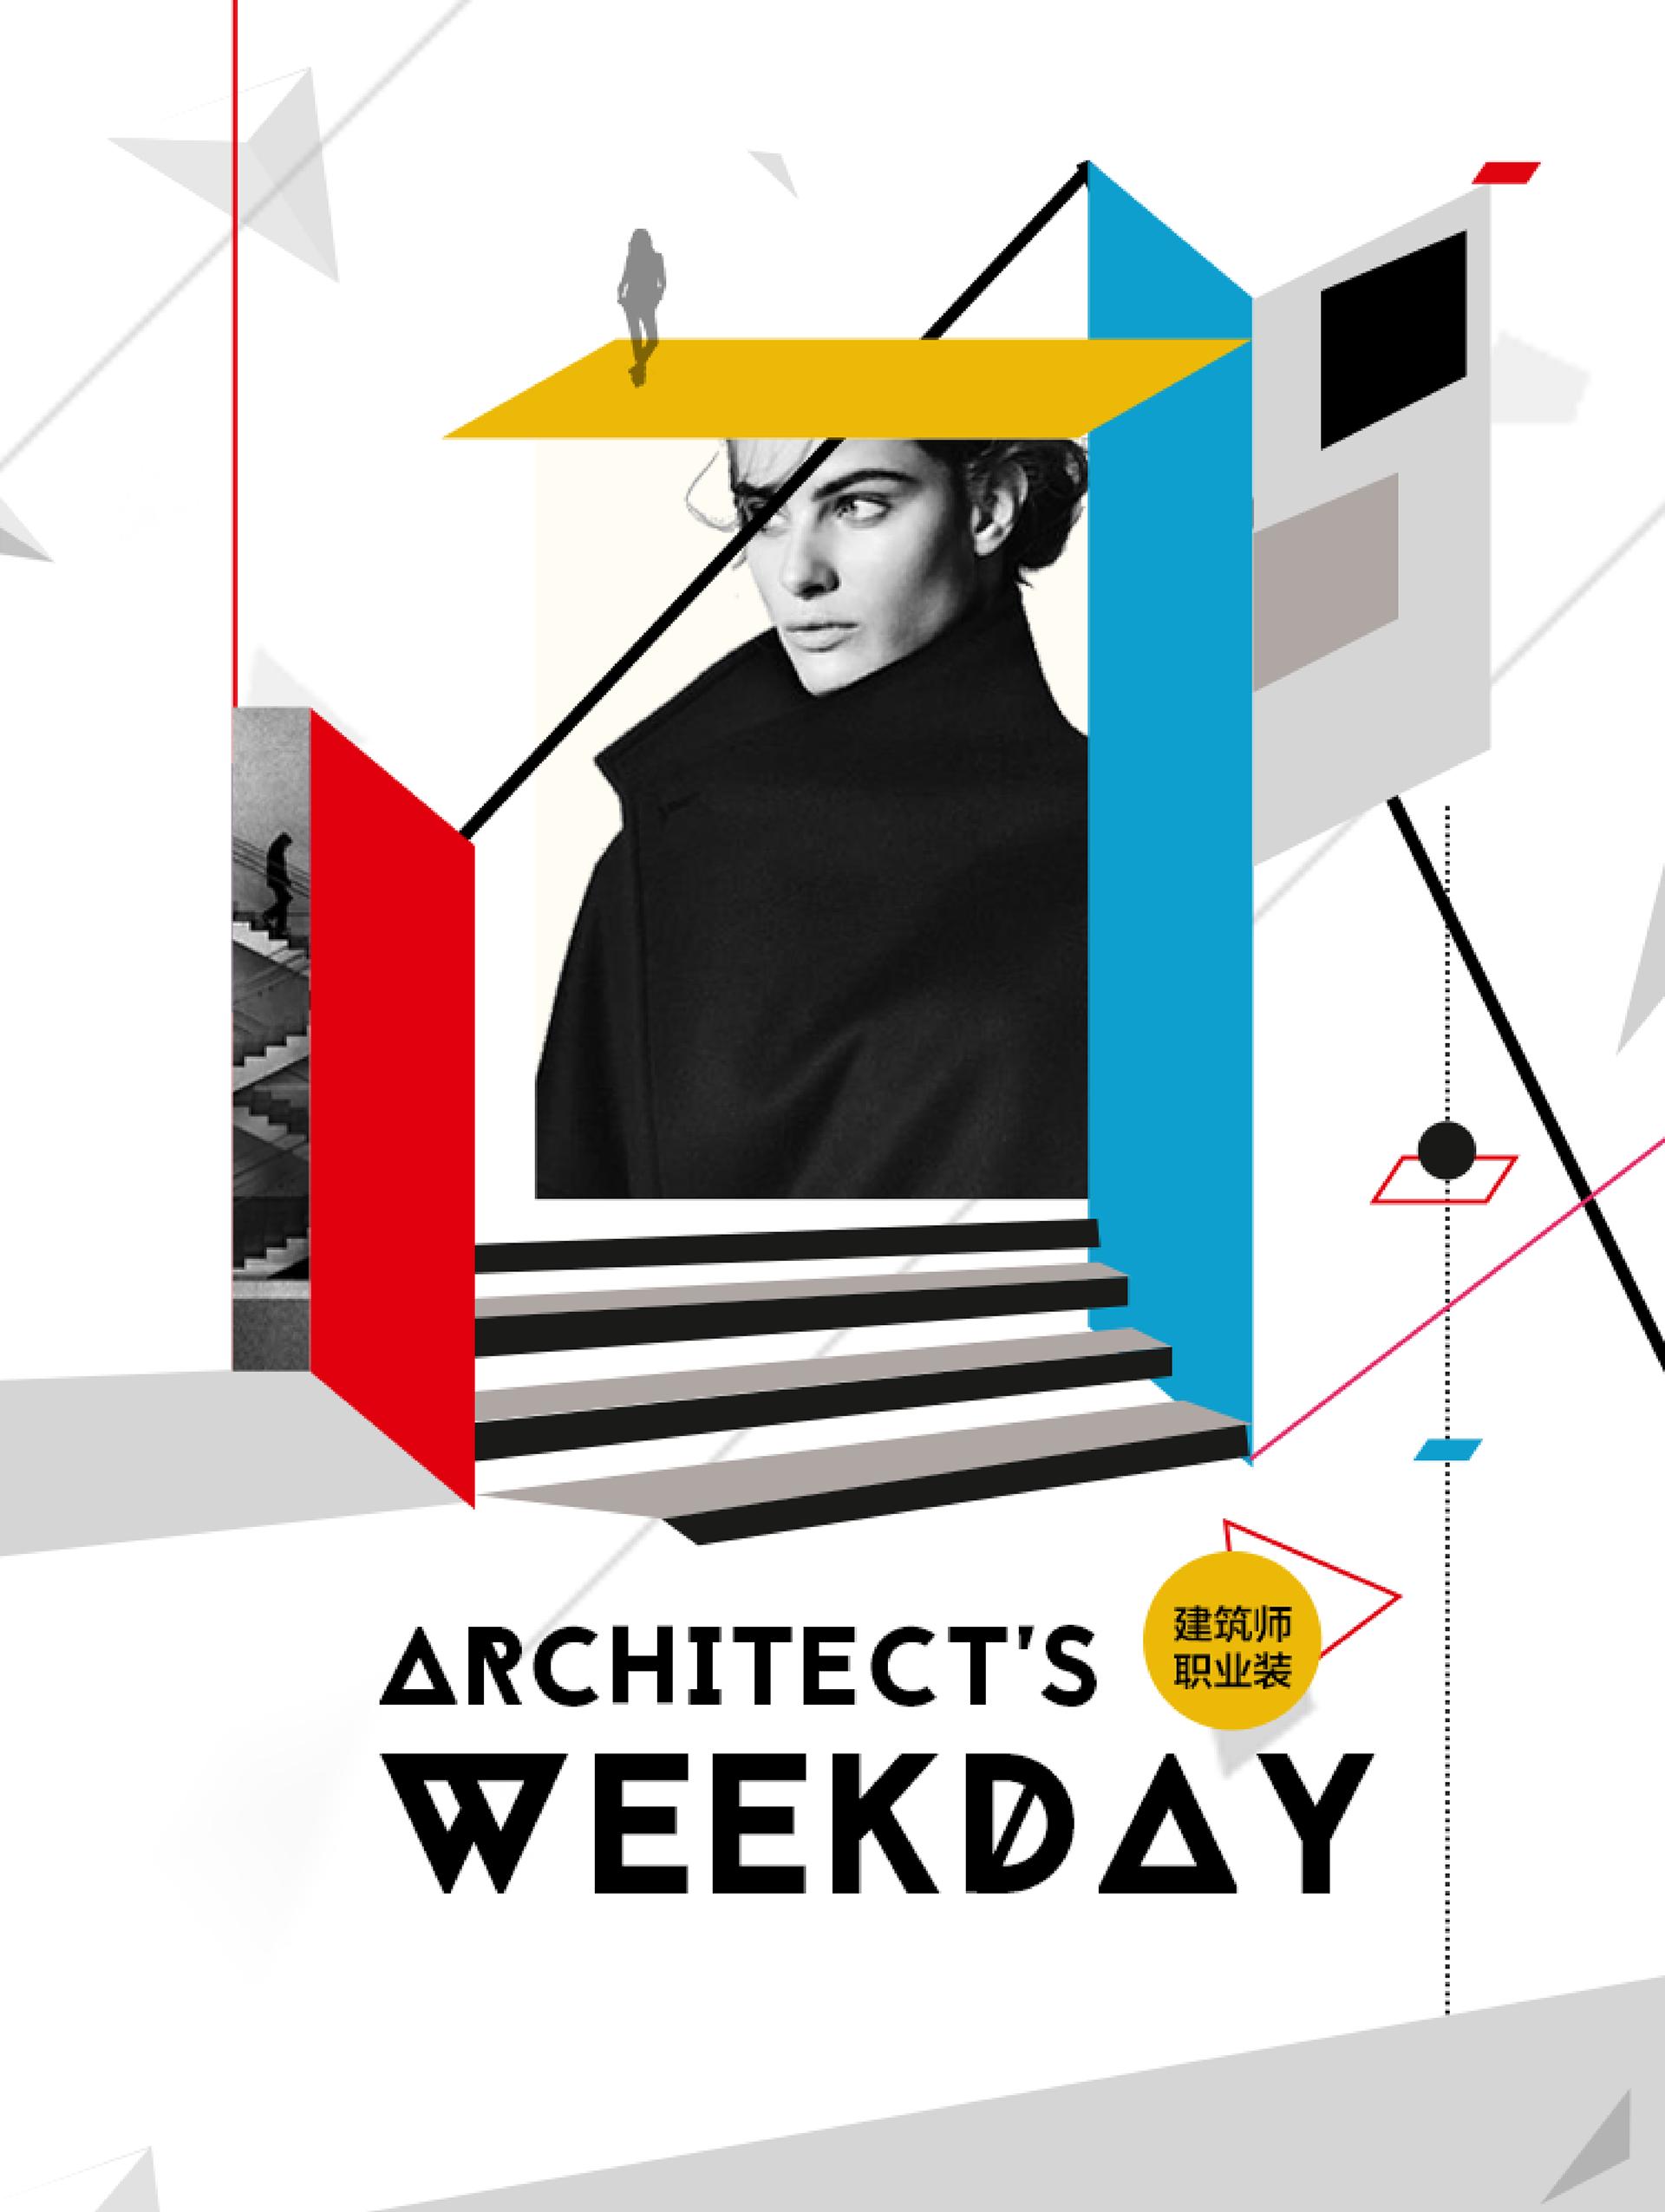 Danyao Design - Women Architect's Dress Code